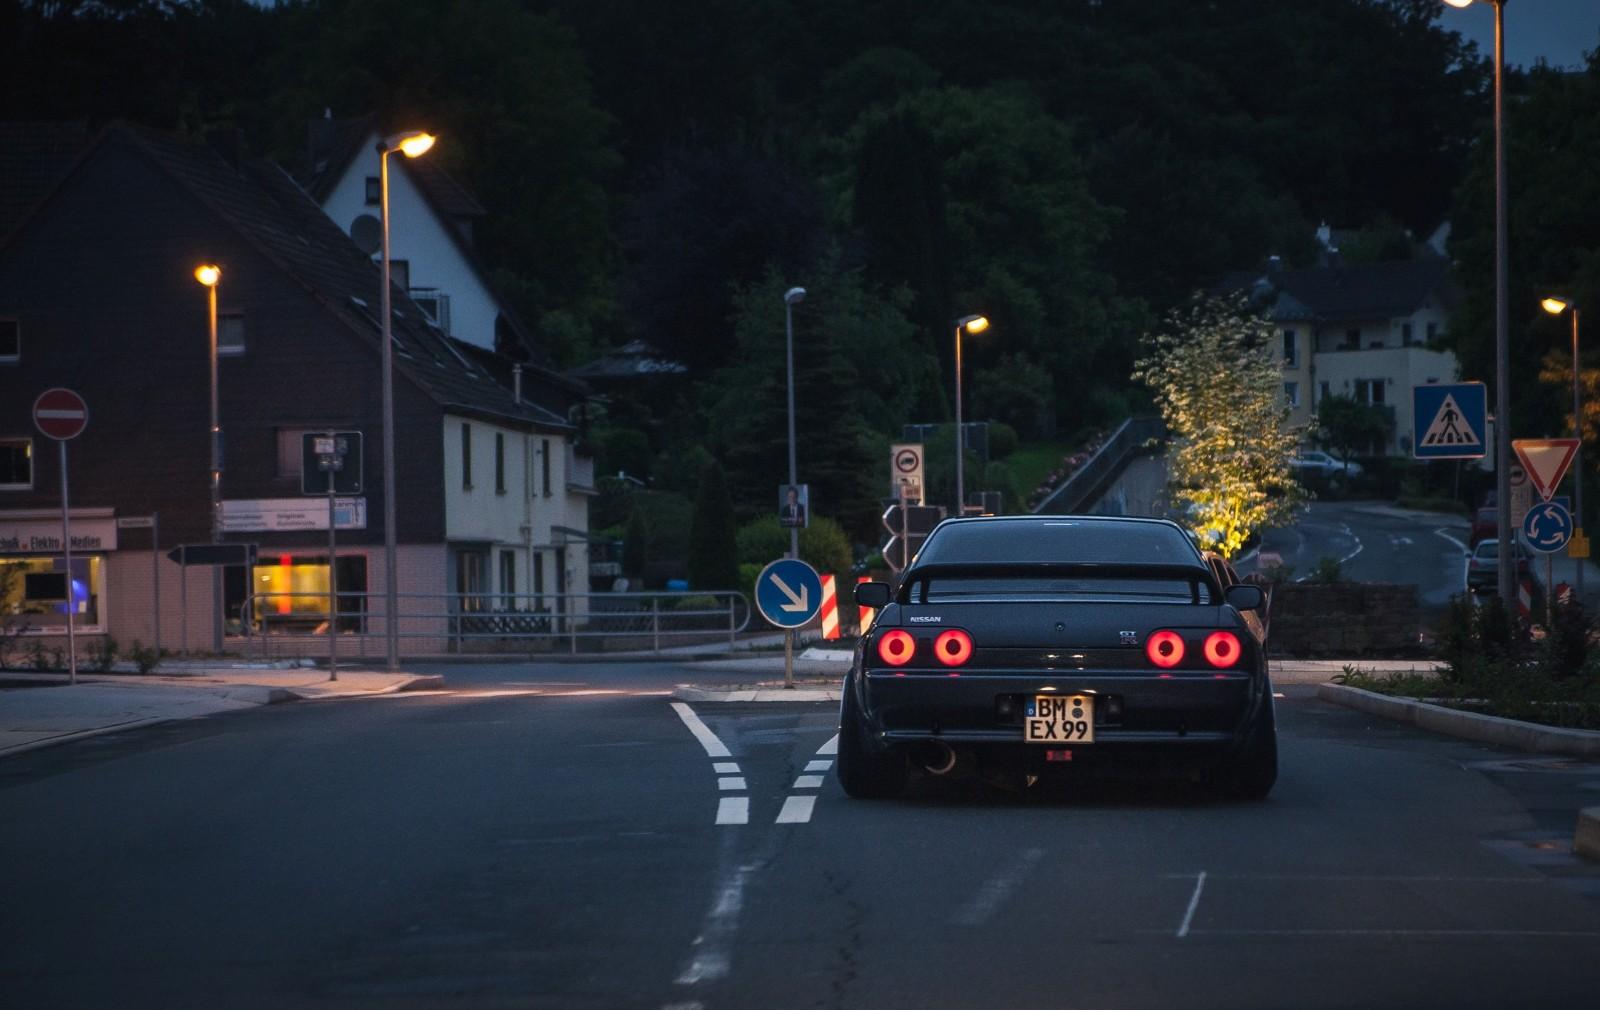 Wallpaper : Japan, forest, street light, portrait, night ...